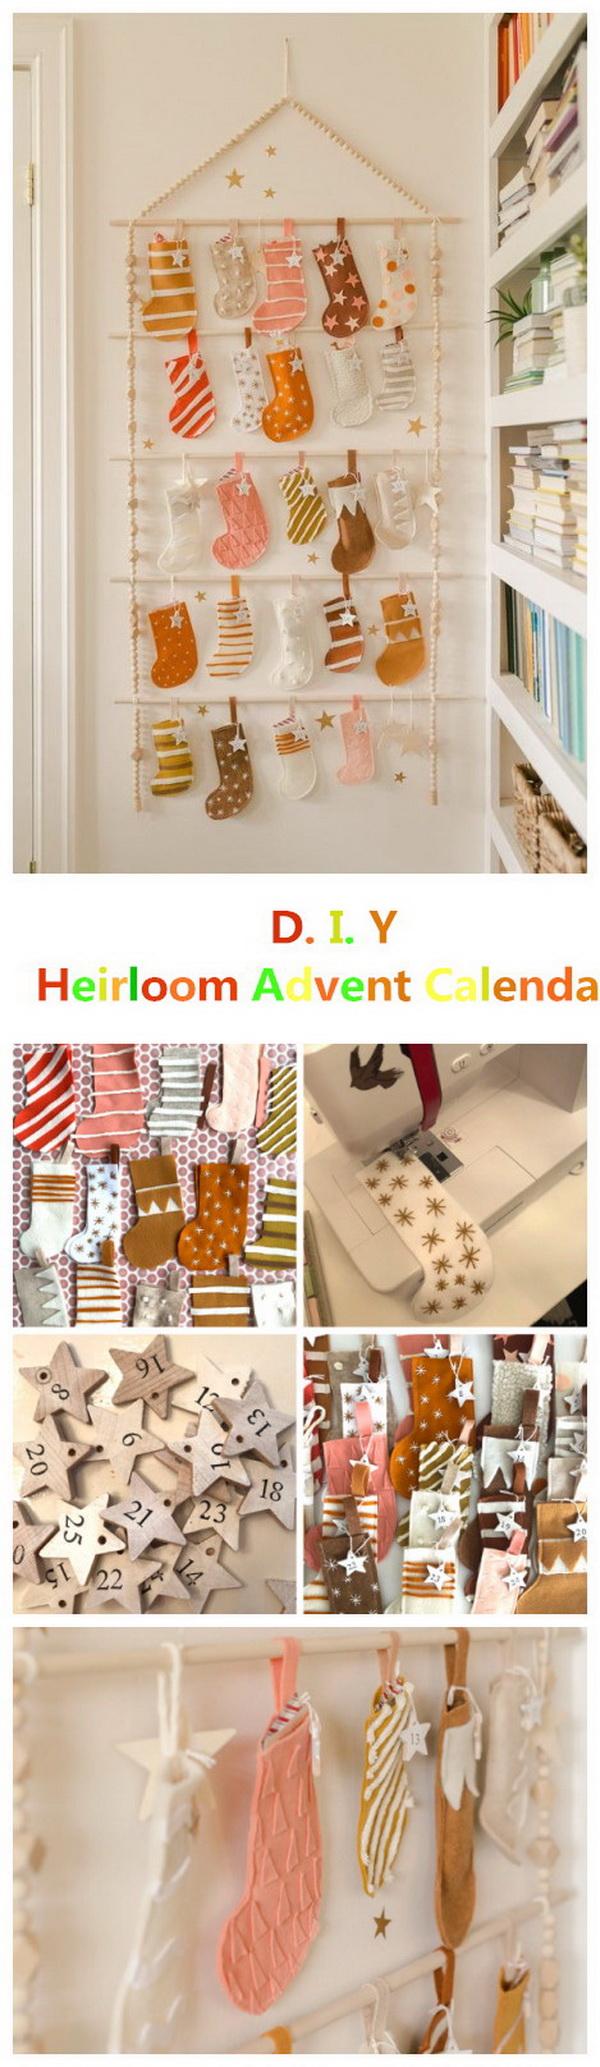 Felt Stockings Heirloom Advent Calendar DIY.